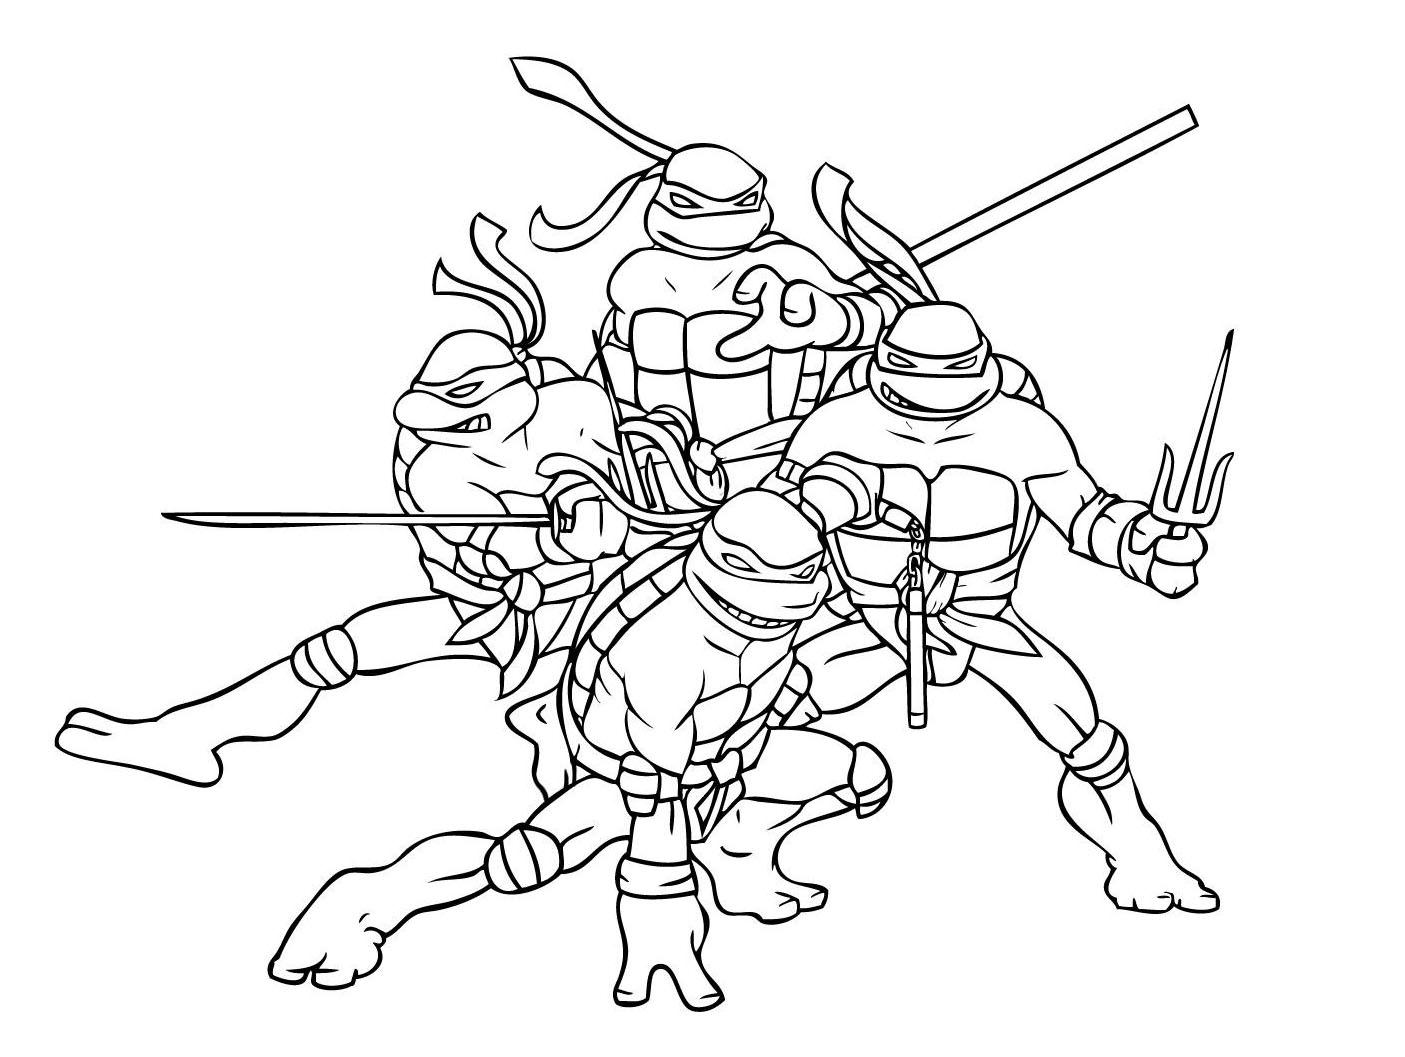 dessin tortue ninja gratuit